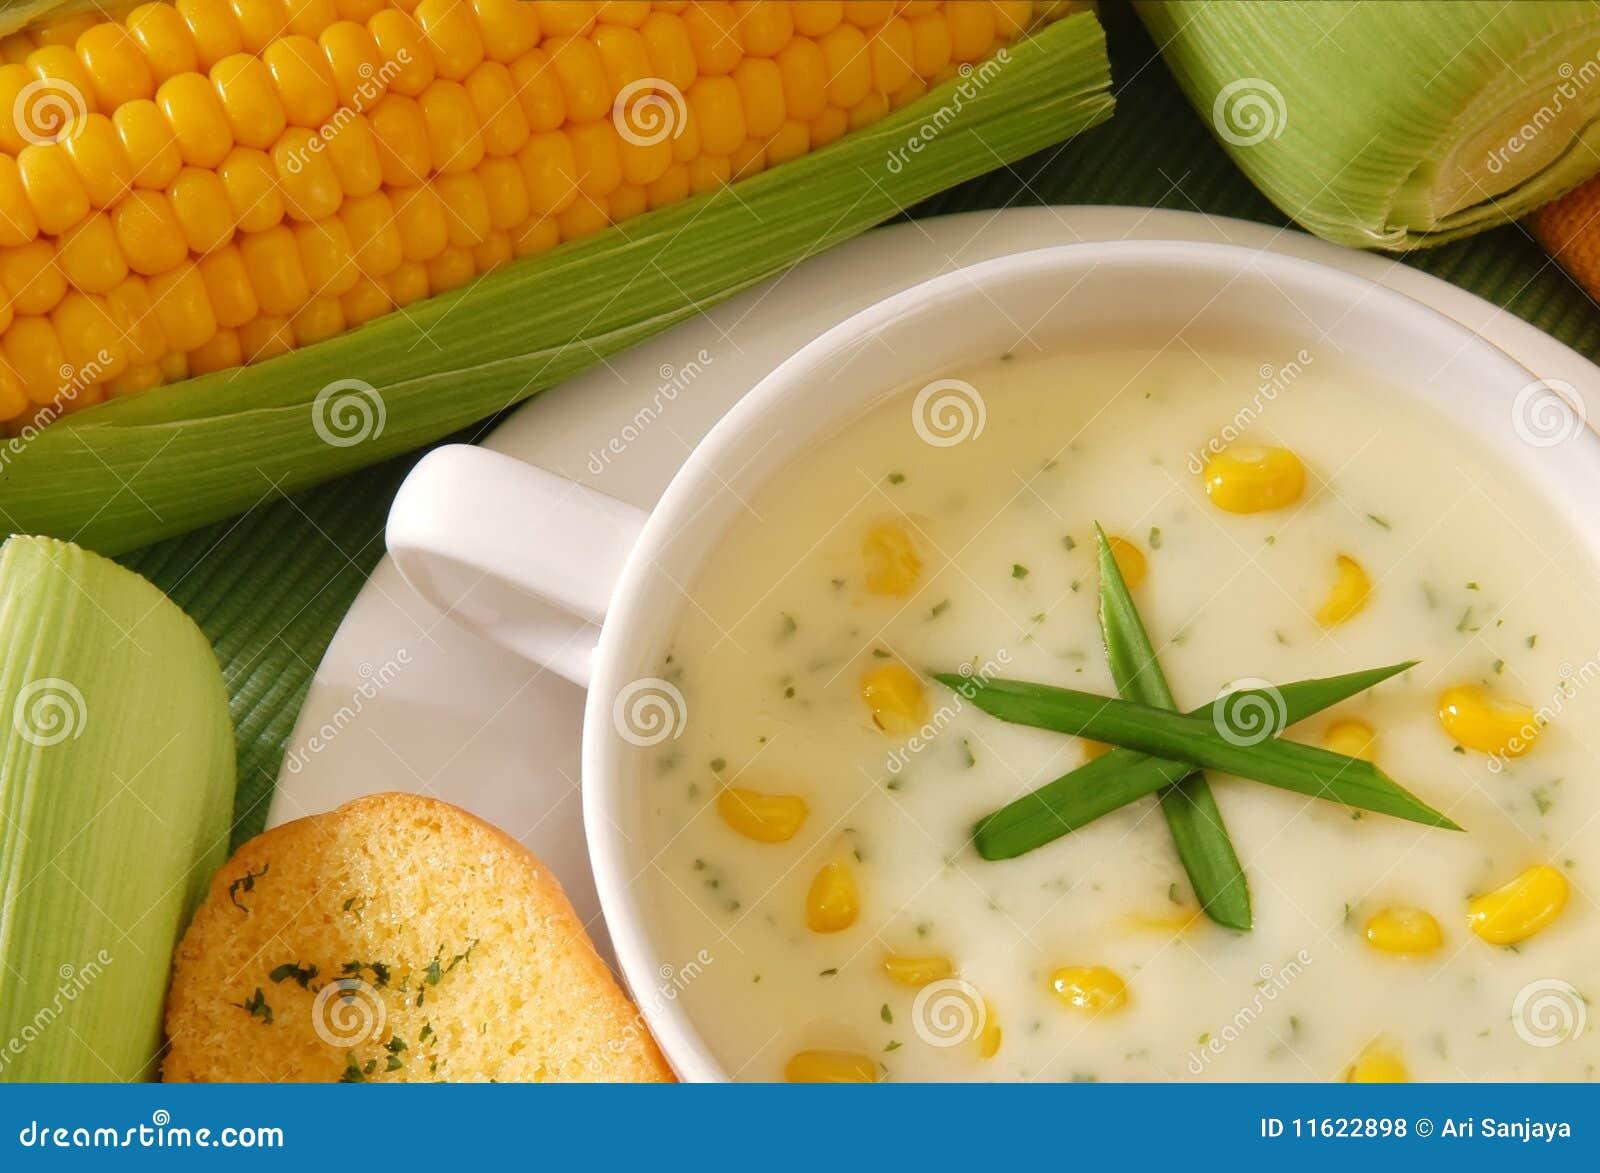 Fresh corn soup with bread and fresh corn on studio setting.